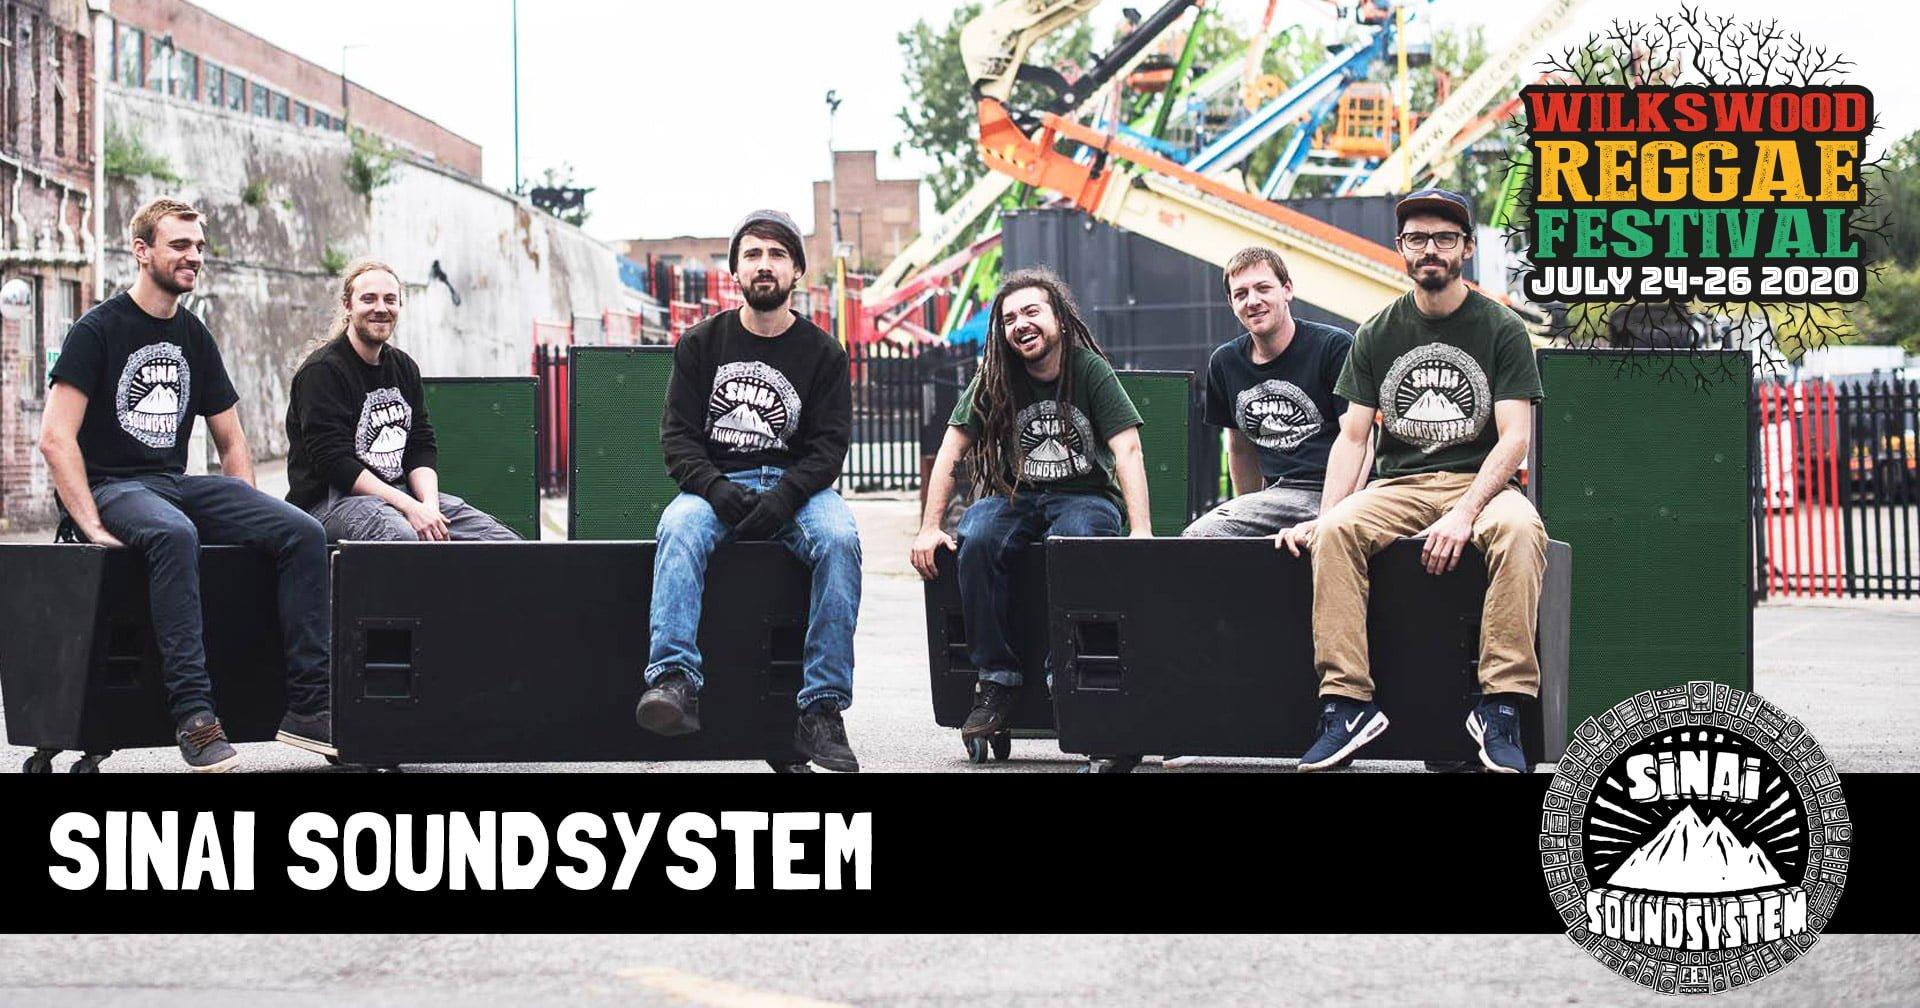 Sinai Soundsystem bringing their own custom-built rig to headline Wilkswood Reggae 2020